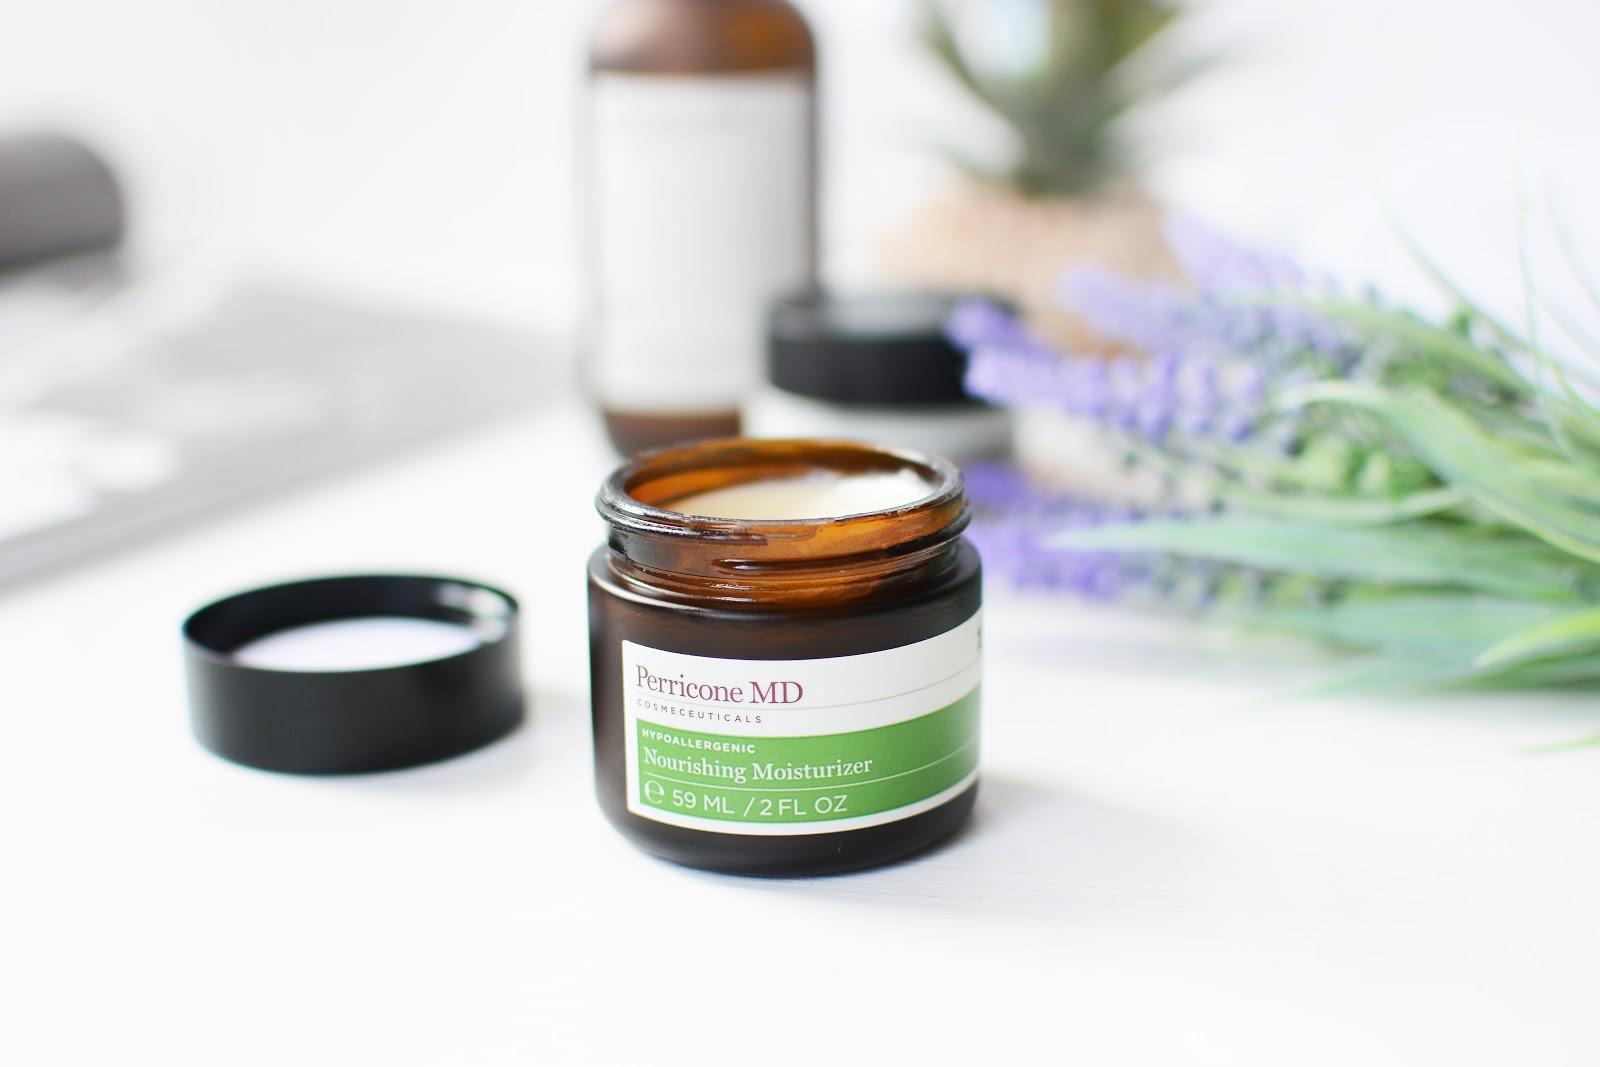 perricone md skincare nourishing moisturizer